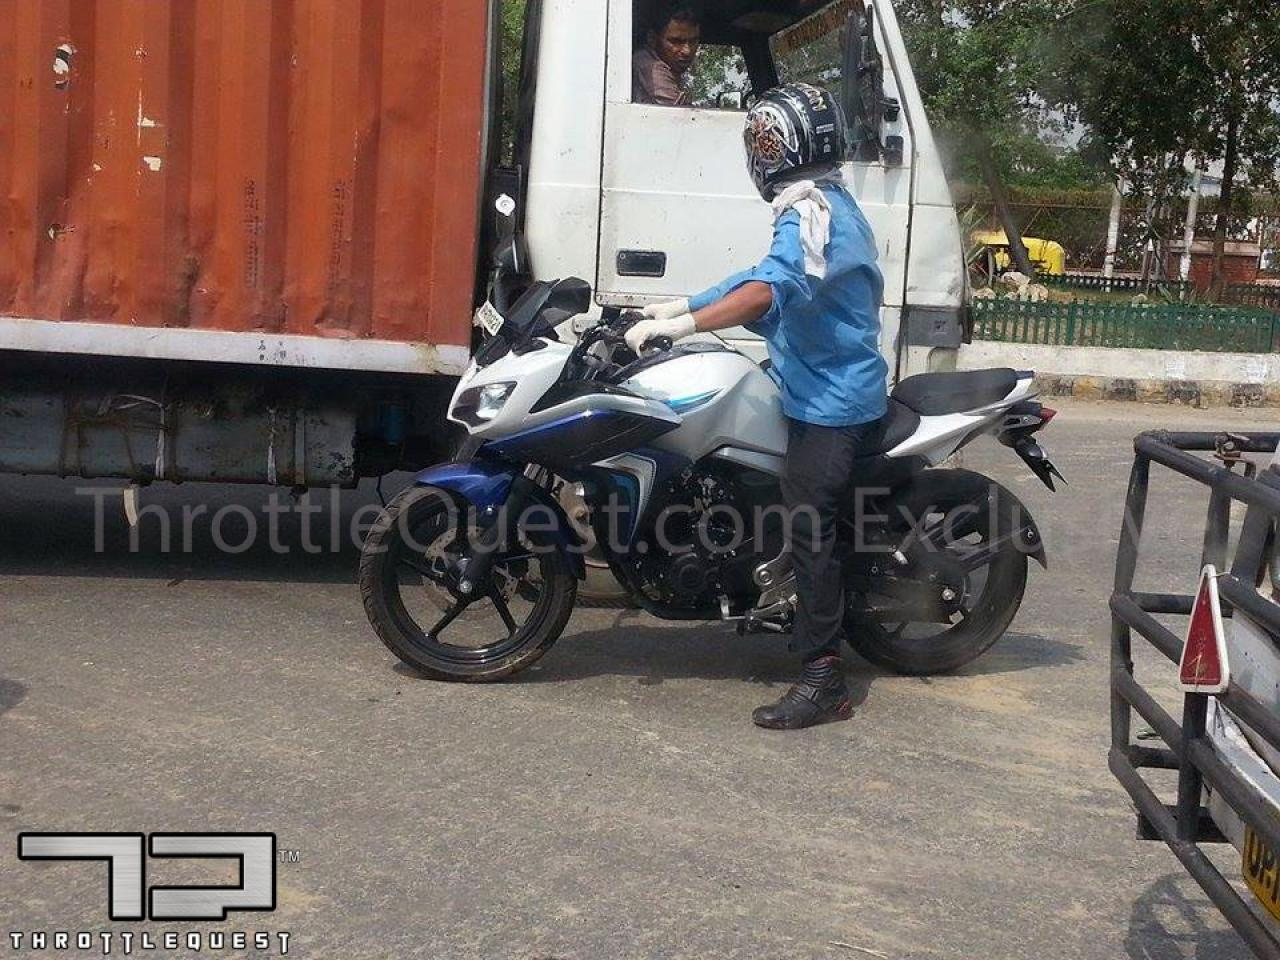 Yamaha Fazer facelift spotted testing